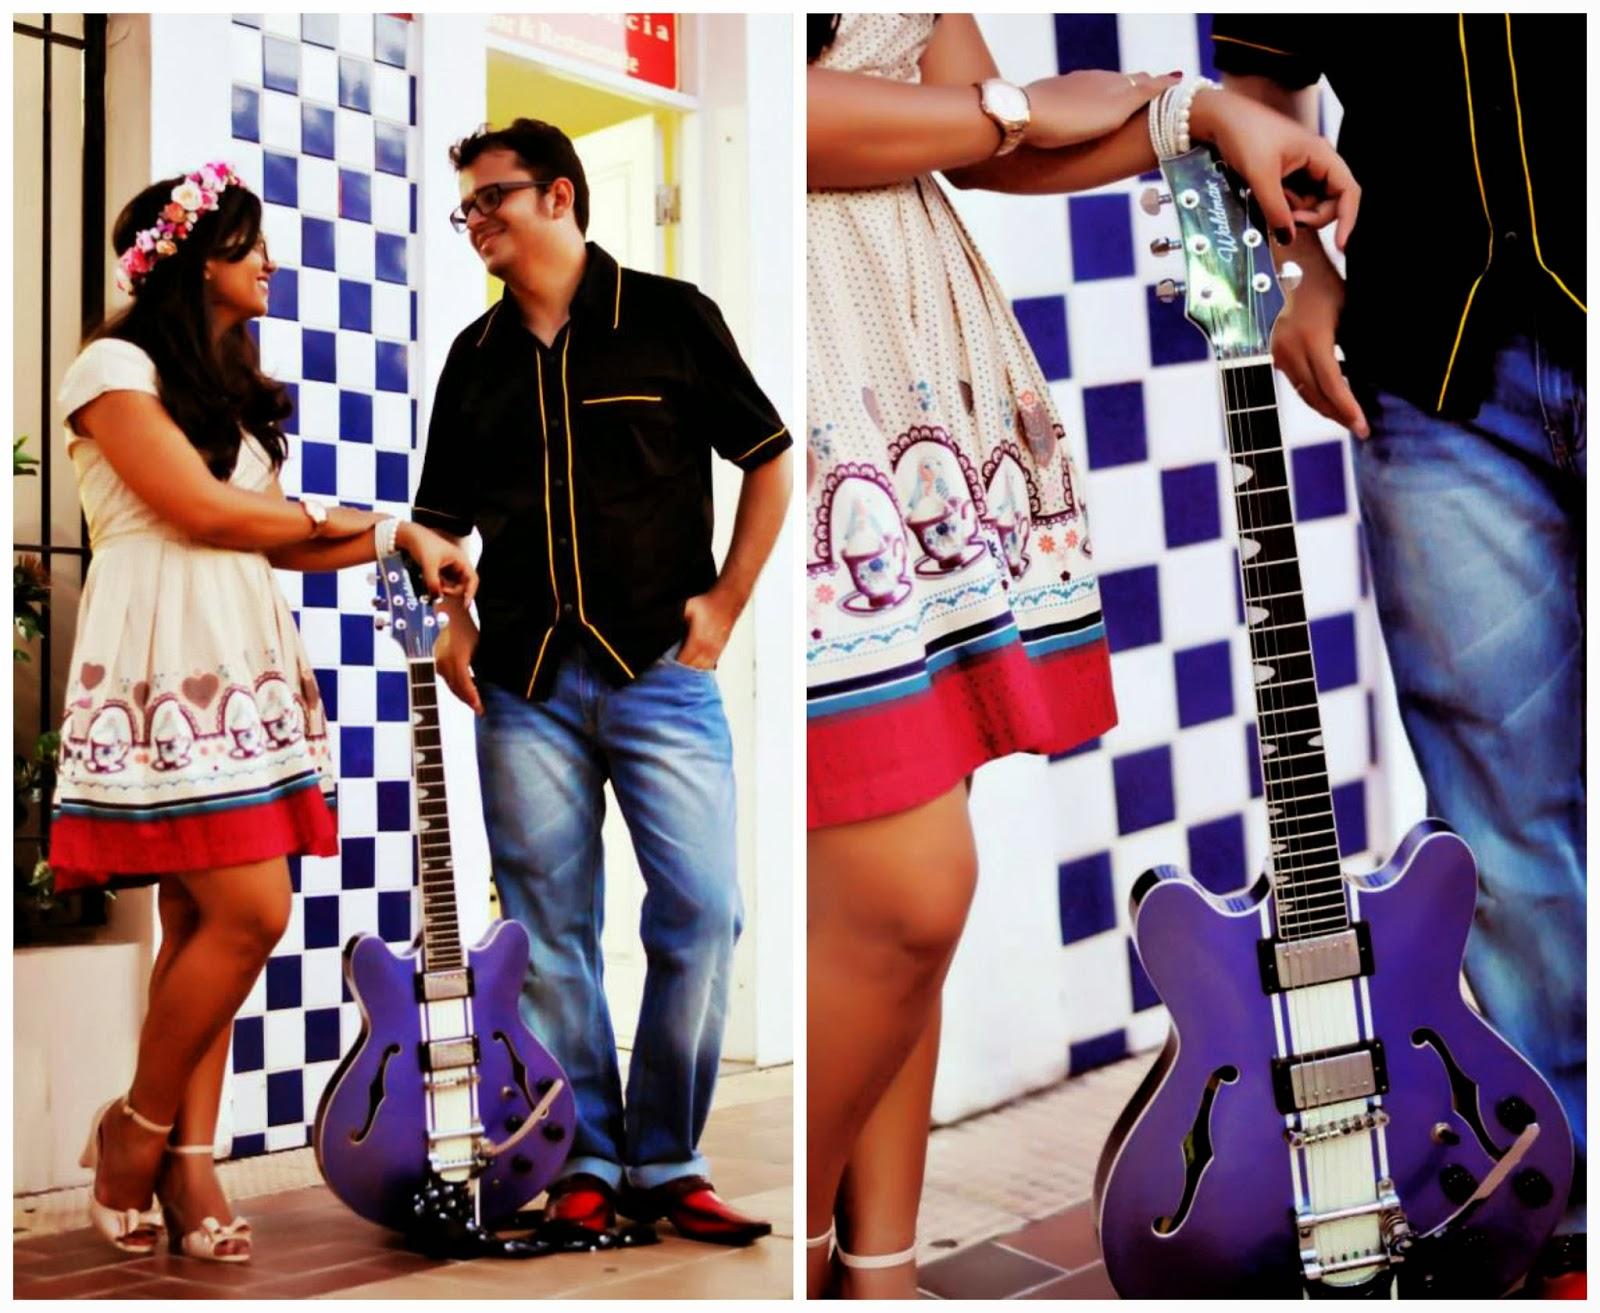 esession-save-the-date-vestido-antix-coroa-de-flores-melissa-guitarra